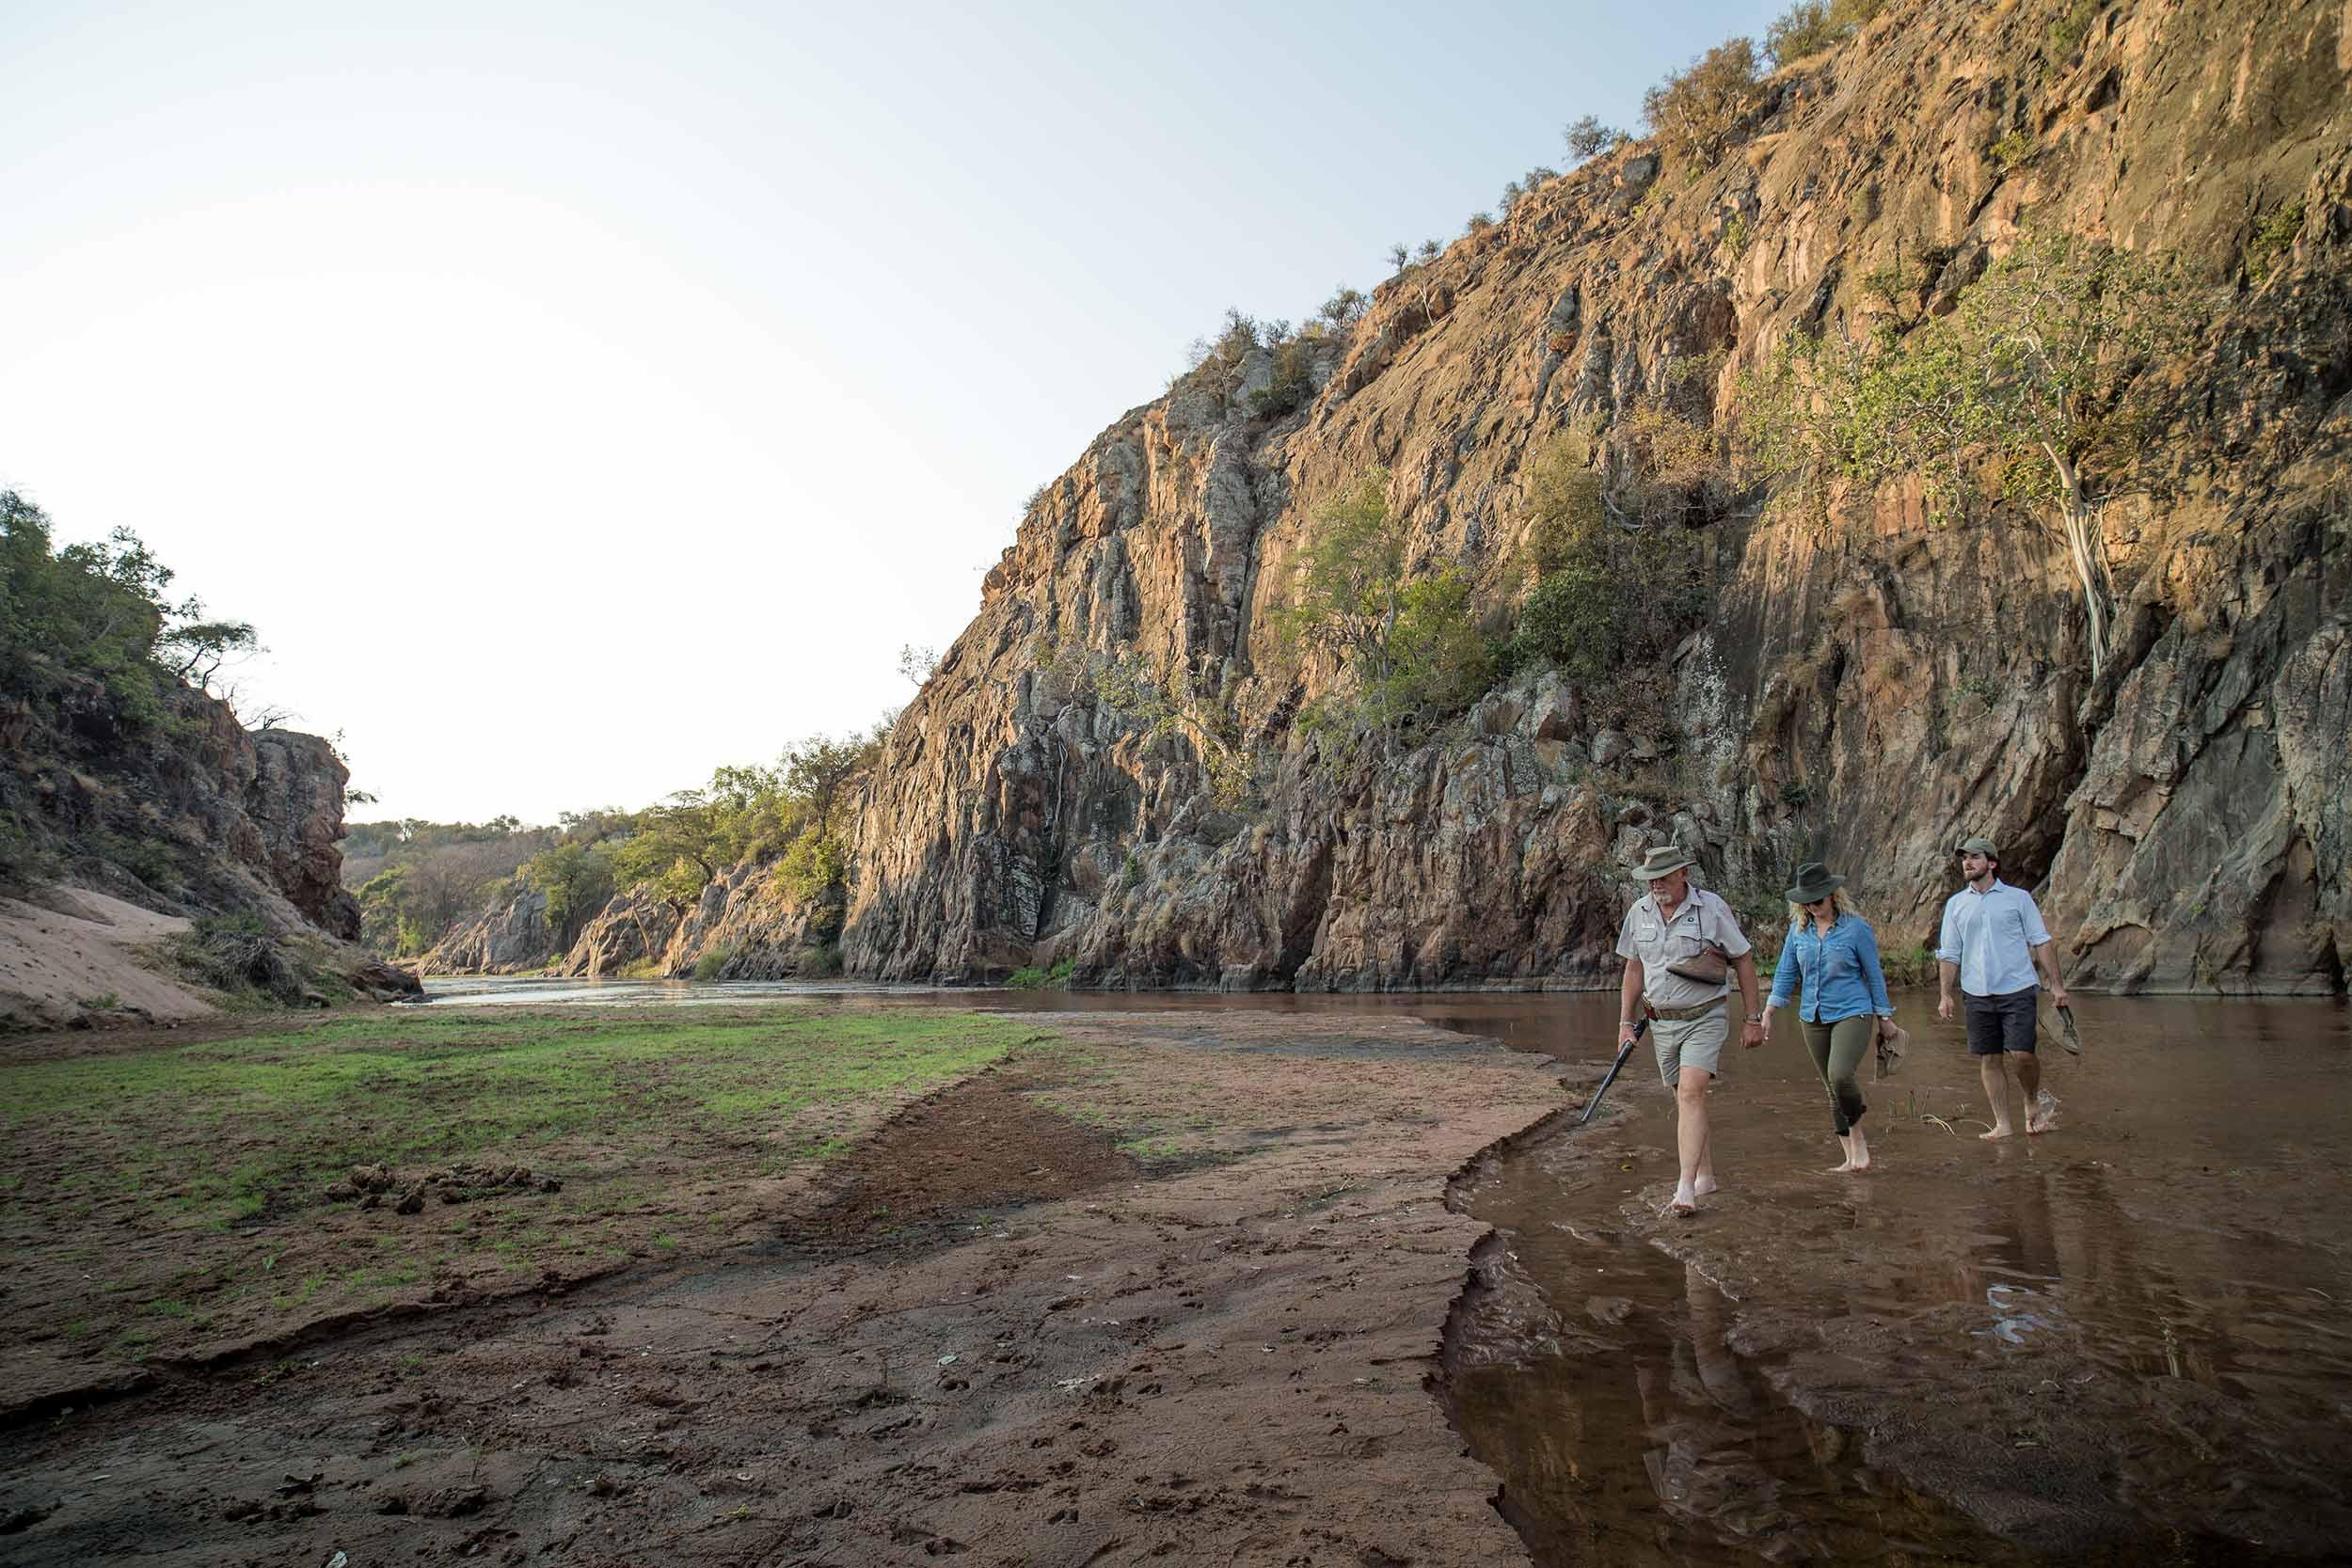 The-Outpost_Black-Bean_Walking-safari_06.jpg